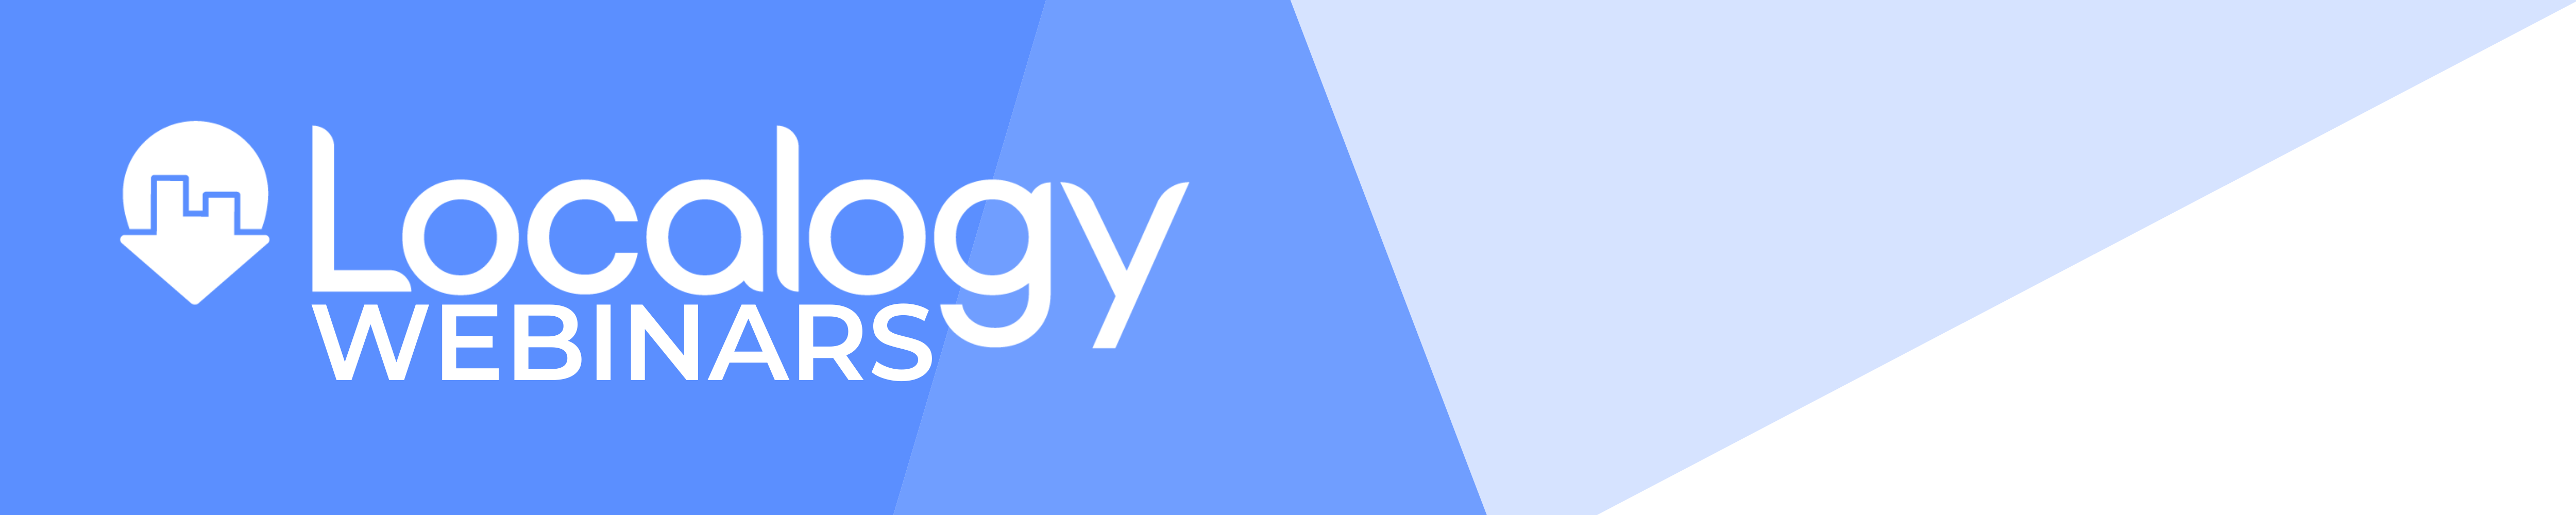 Localogy WEBINARS - Landing Page Banner